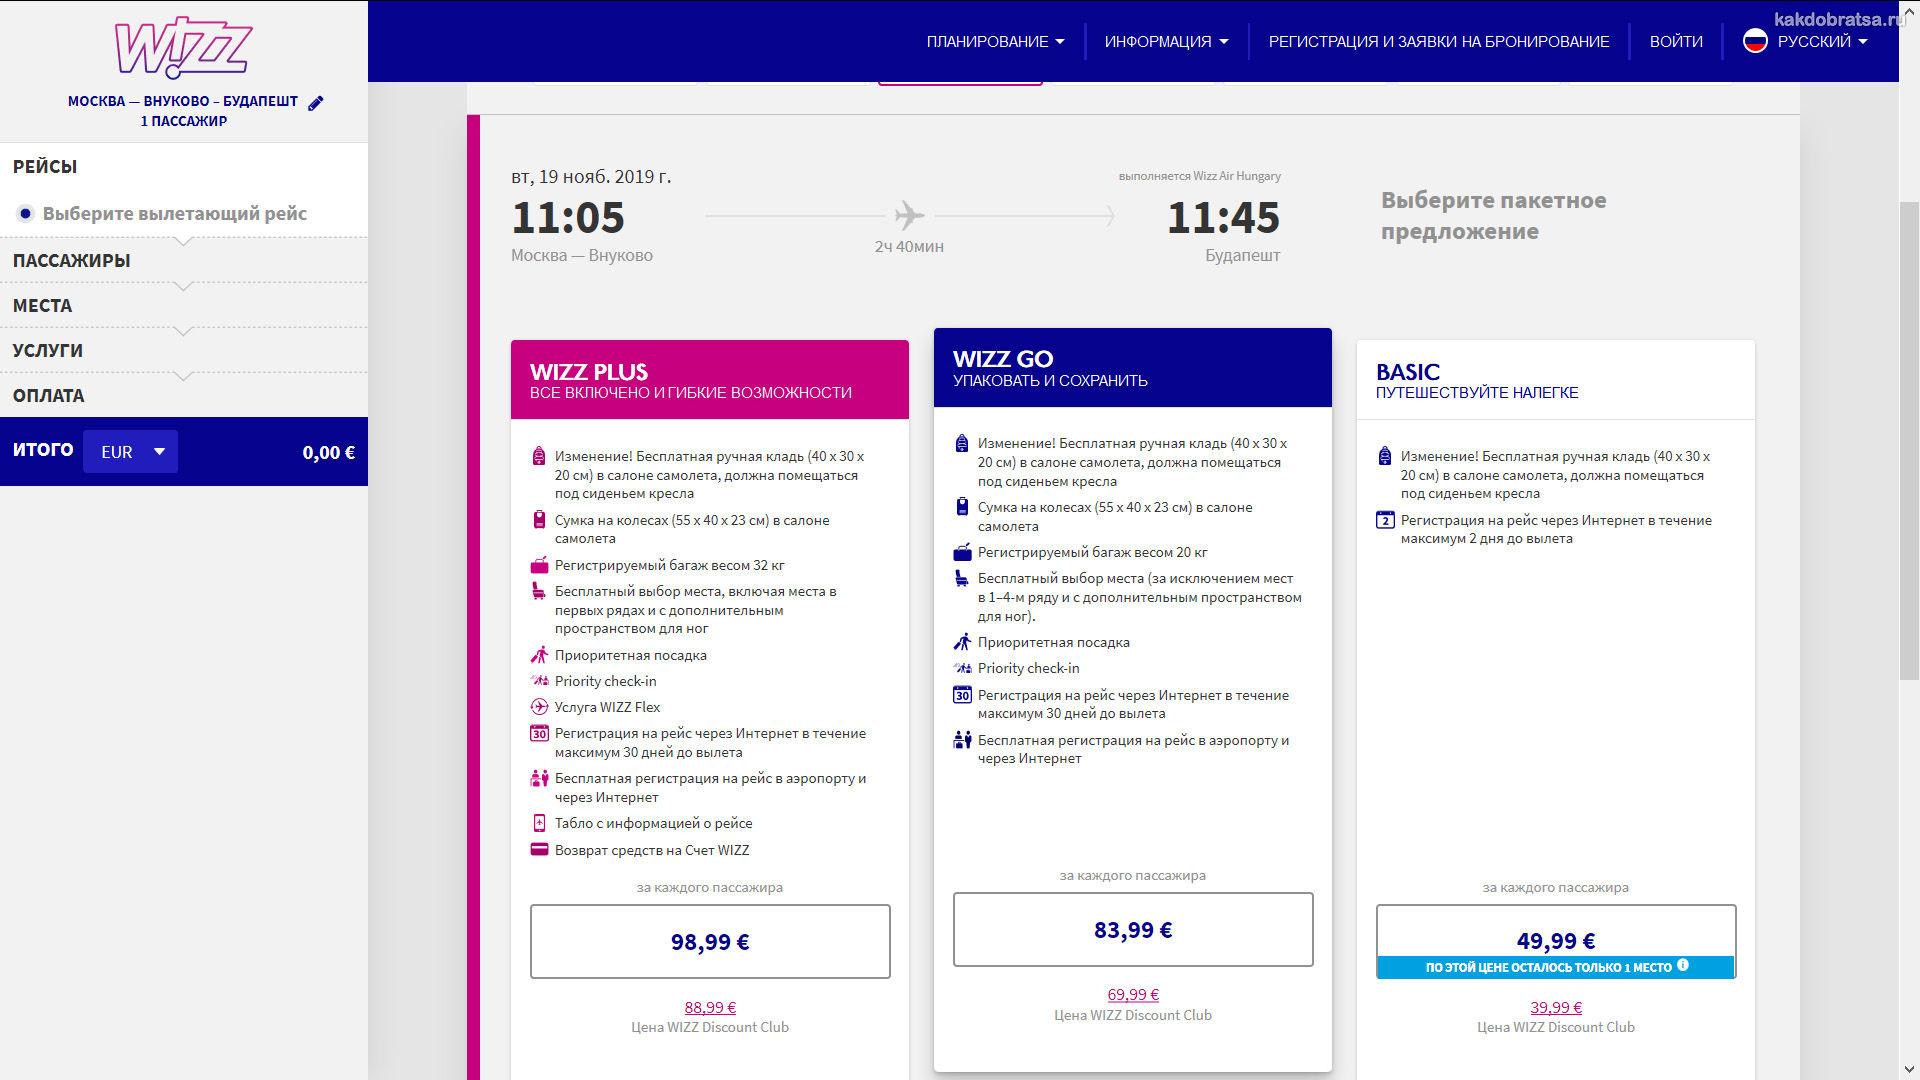 Покупка билета на Wizz Air из Москвы в Будапешт шаг 3